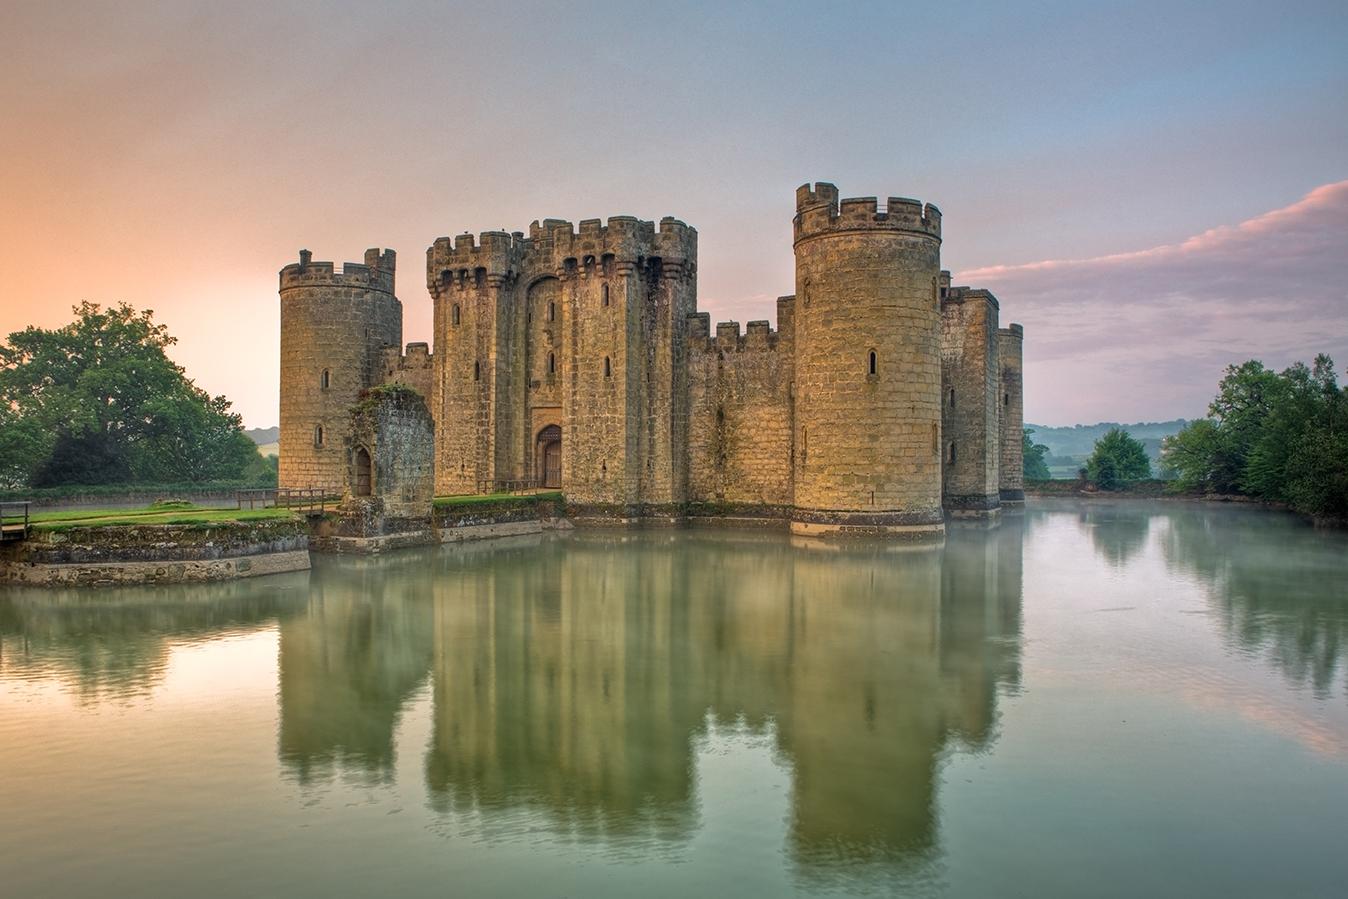 Bodiam Castle, East Sussex, England, UK.